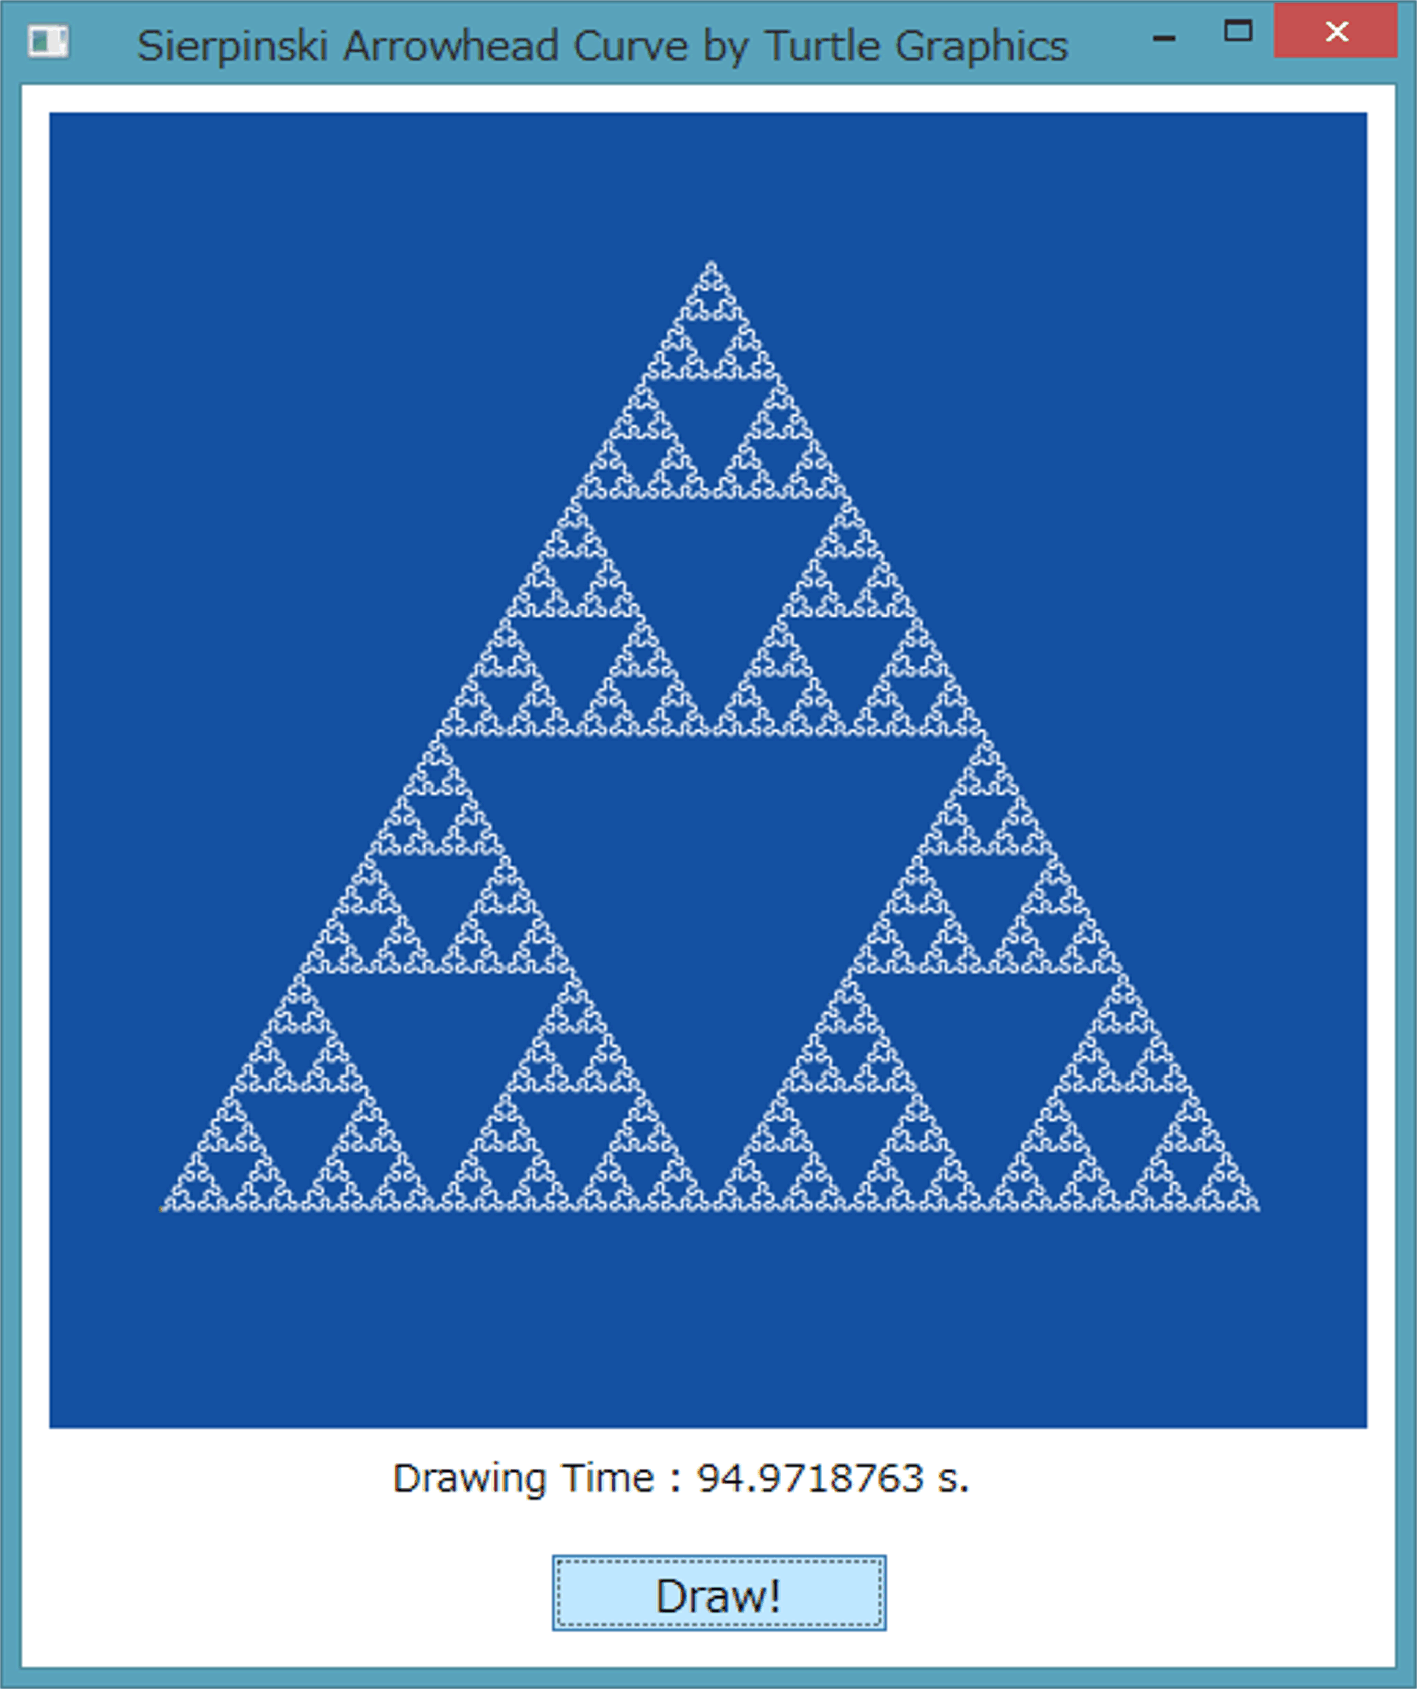 Sierpinski Arrowhead Curve (WPF with C#)